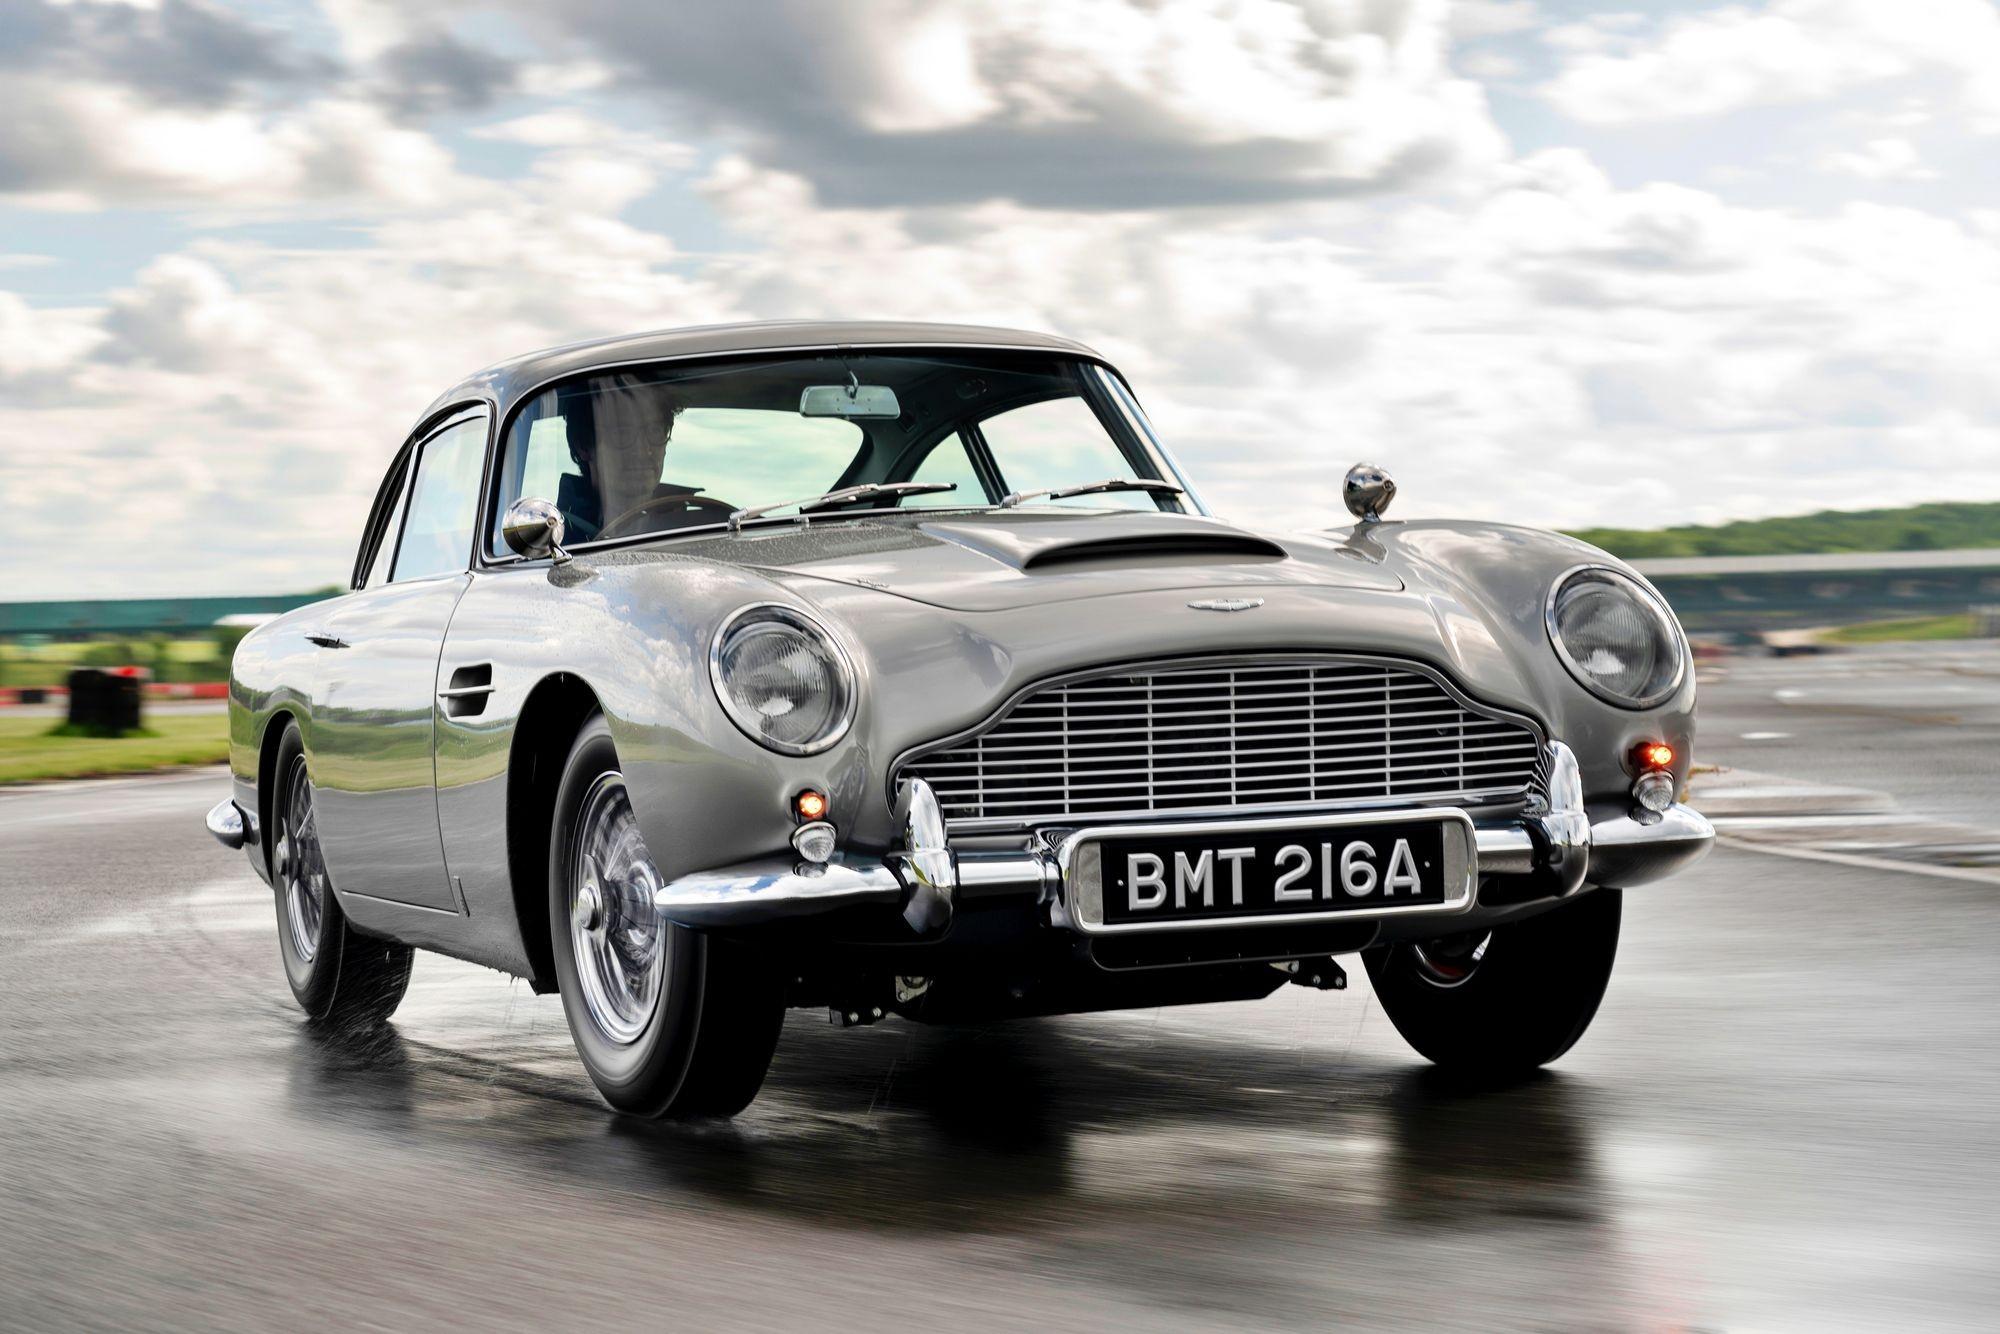 Джеймс Бонд оказался перспективнее электромобилей: Aston Martin шпиона пошёл в серию